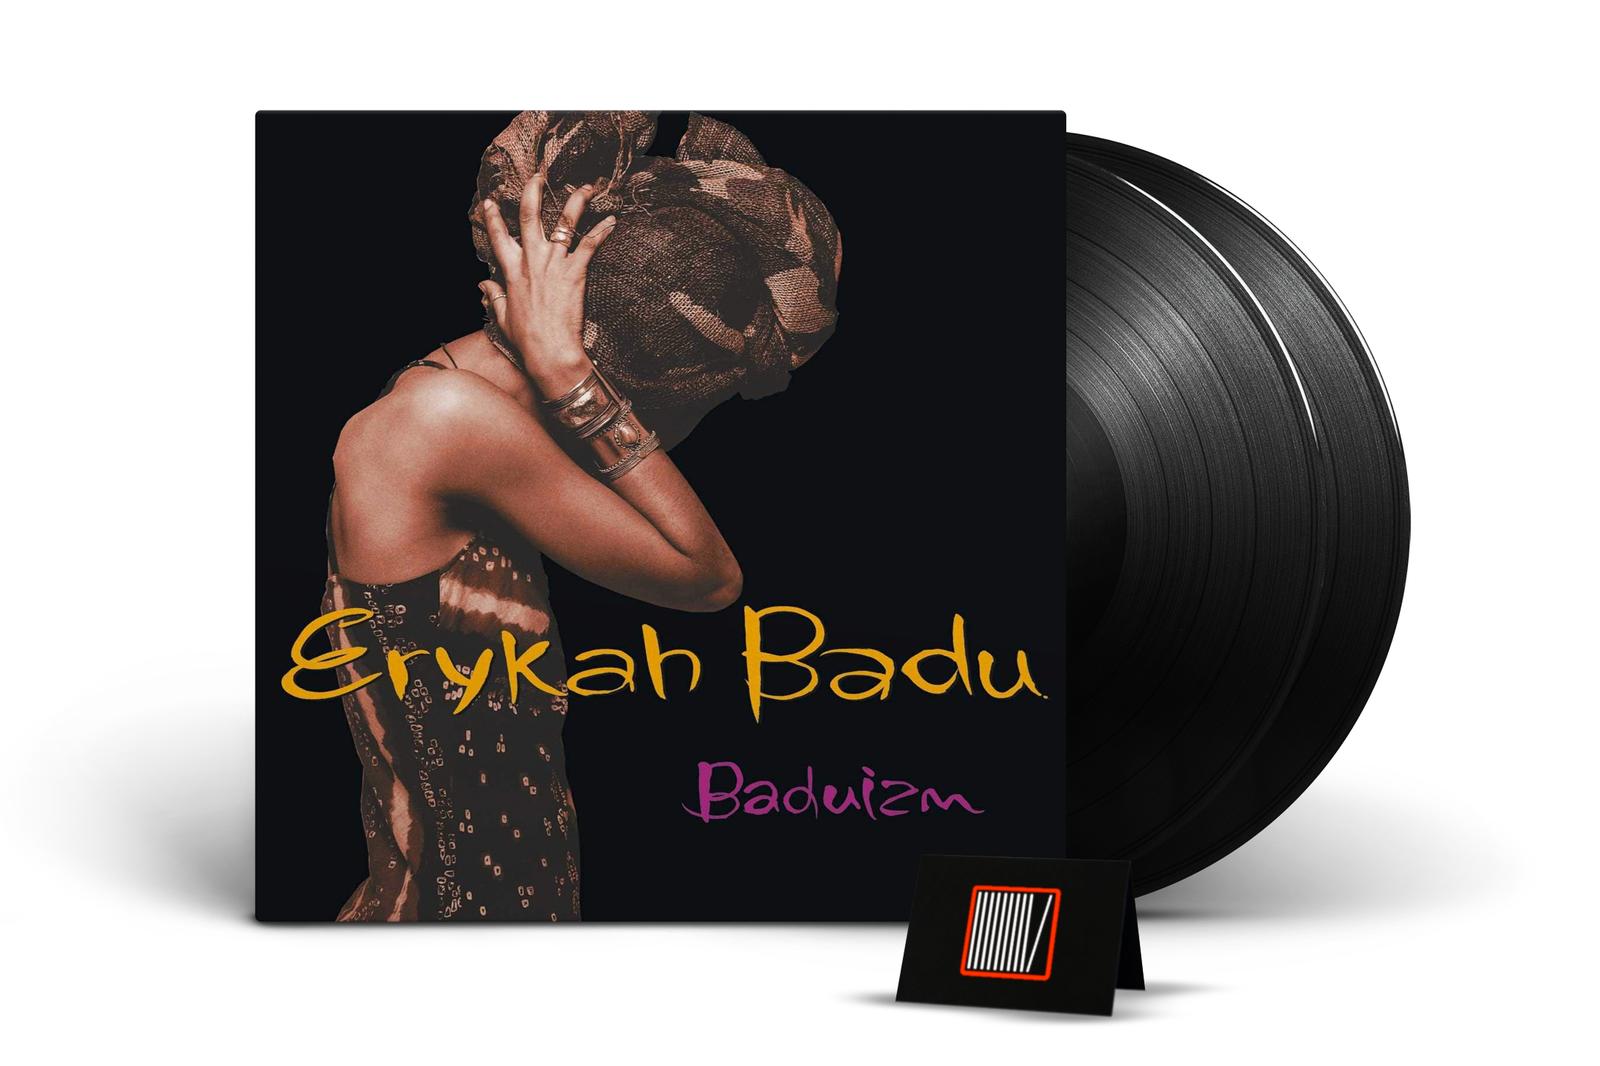 płyta winylowa Erykah Badu